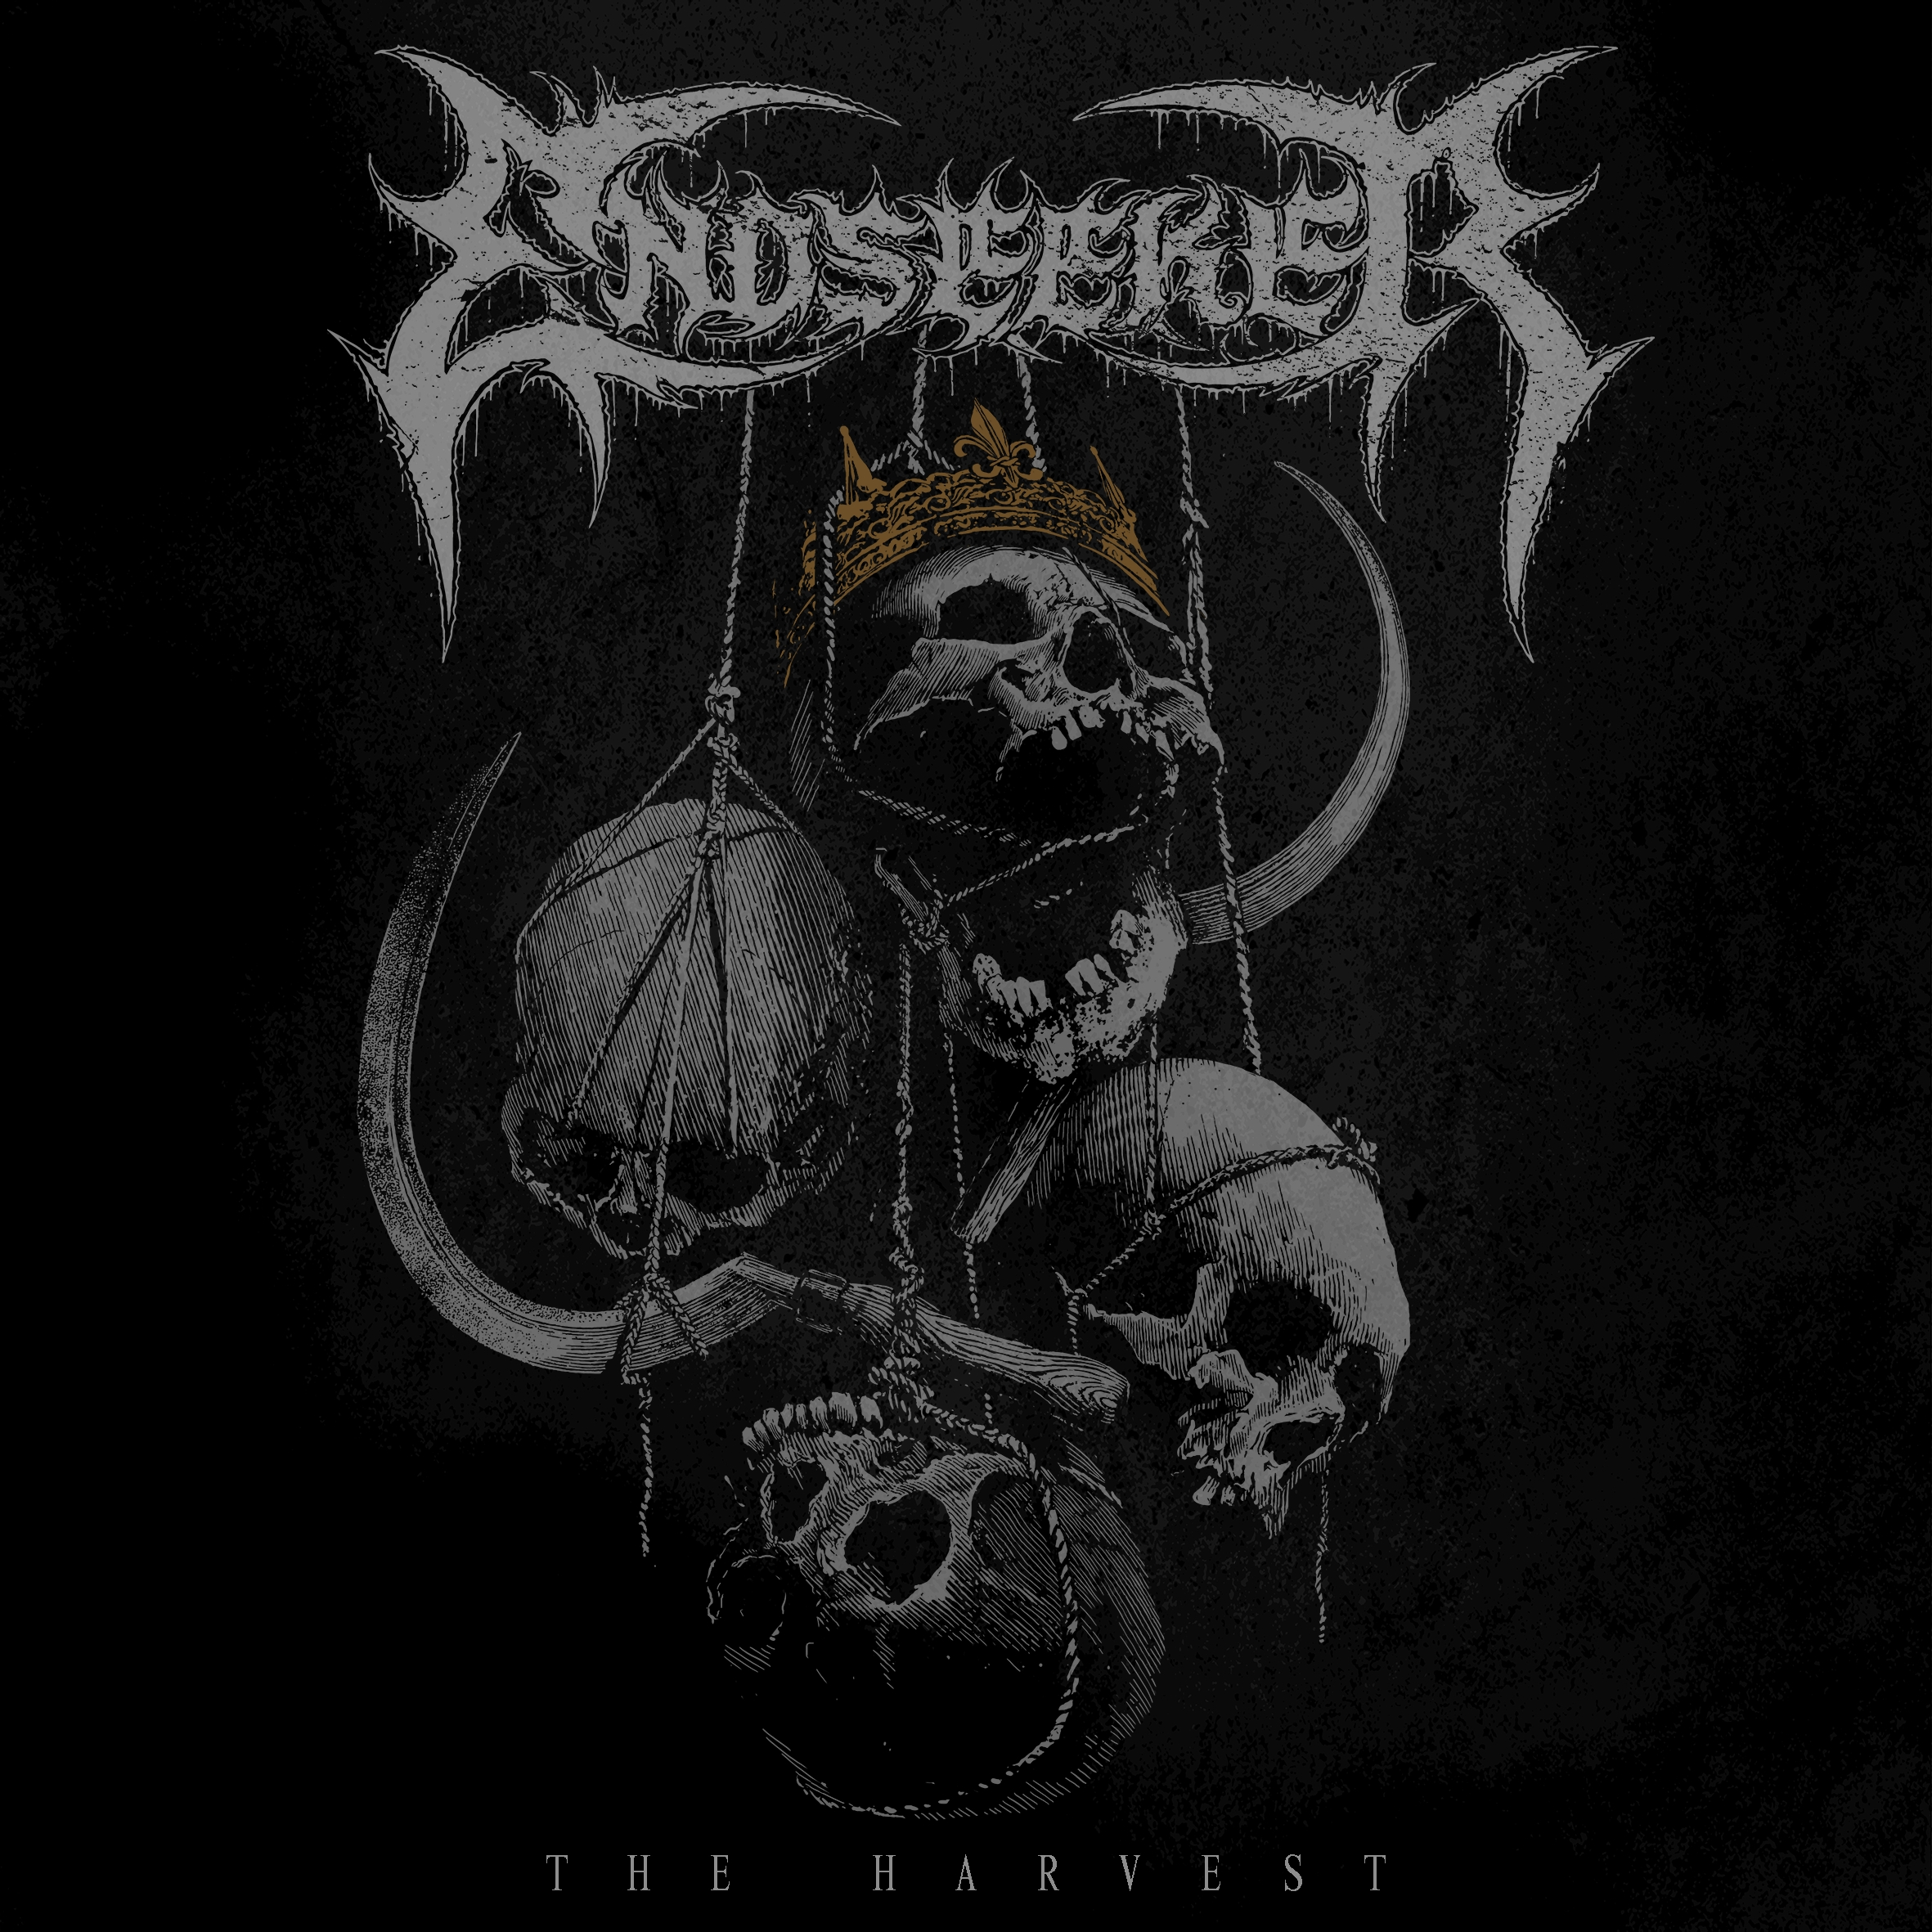 Endseeker - The Harvest - Artwork